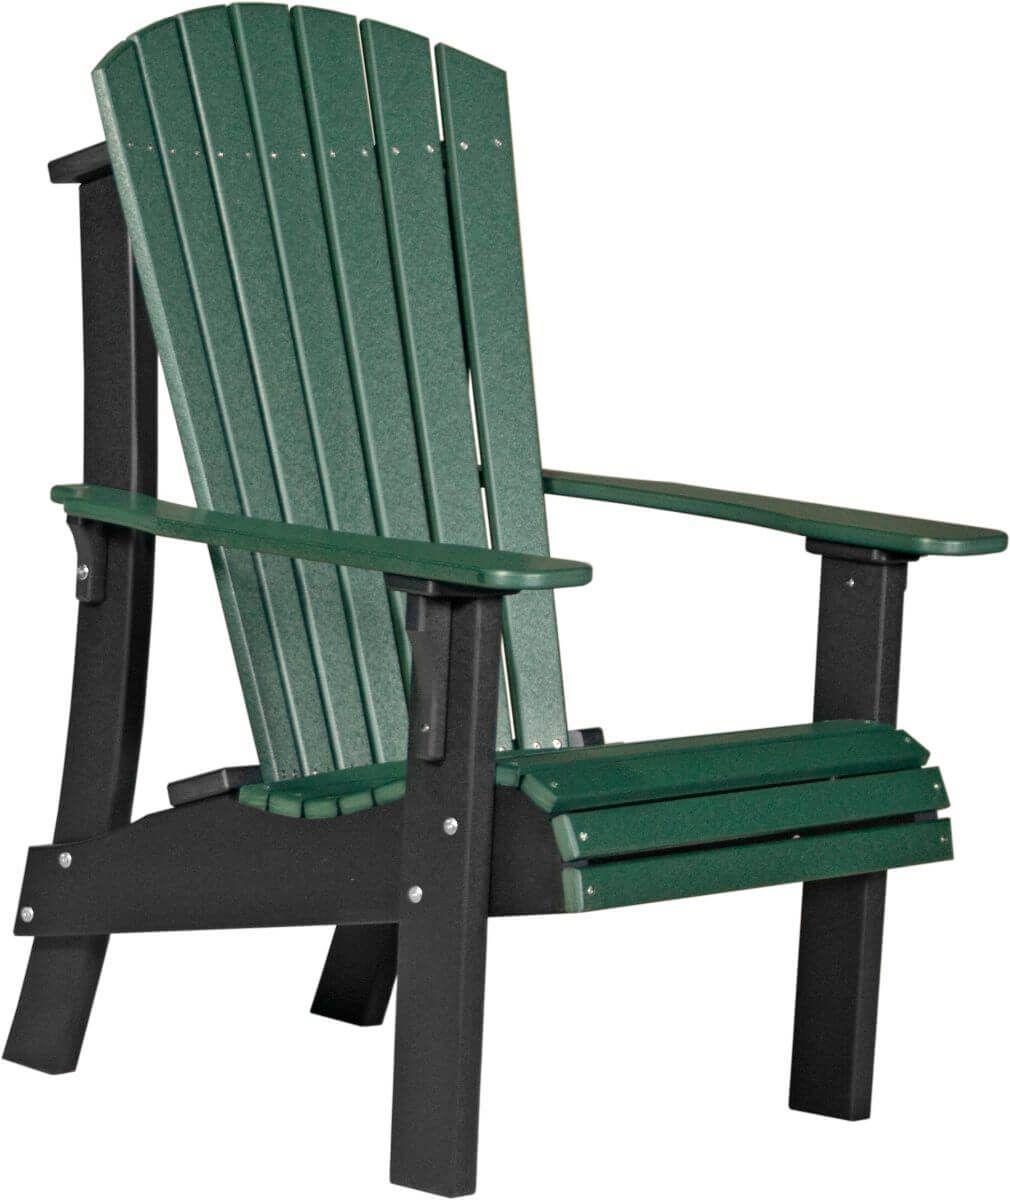 Green and Black Rockaway Highback Adirondack Chair